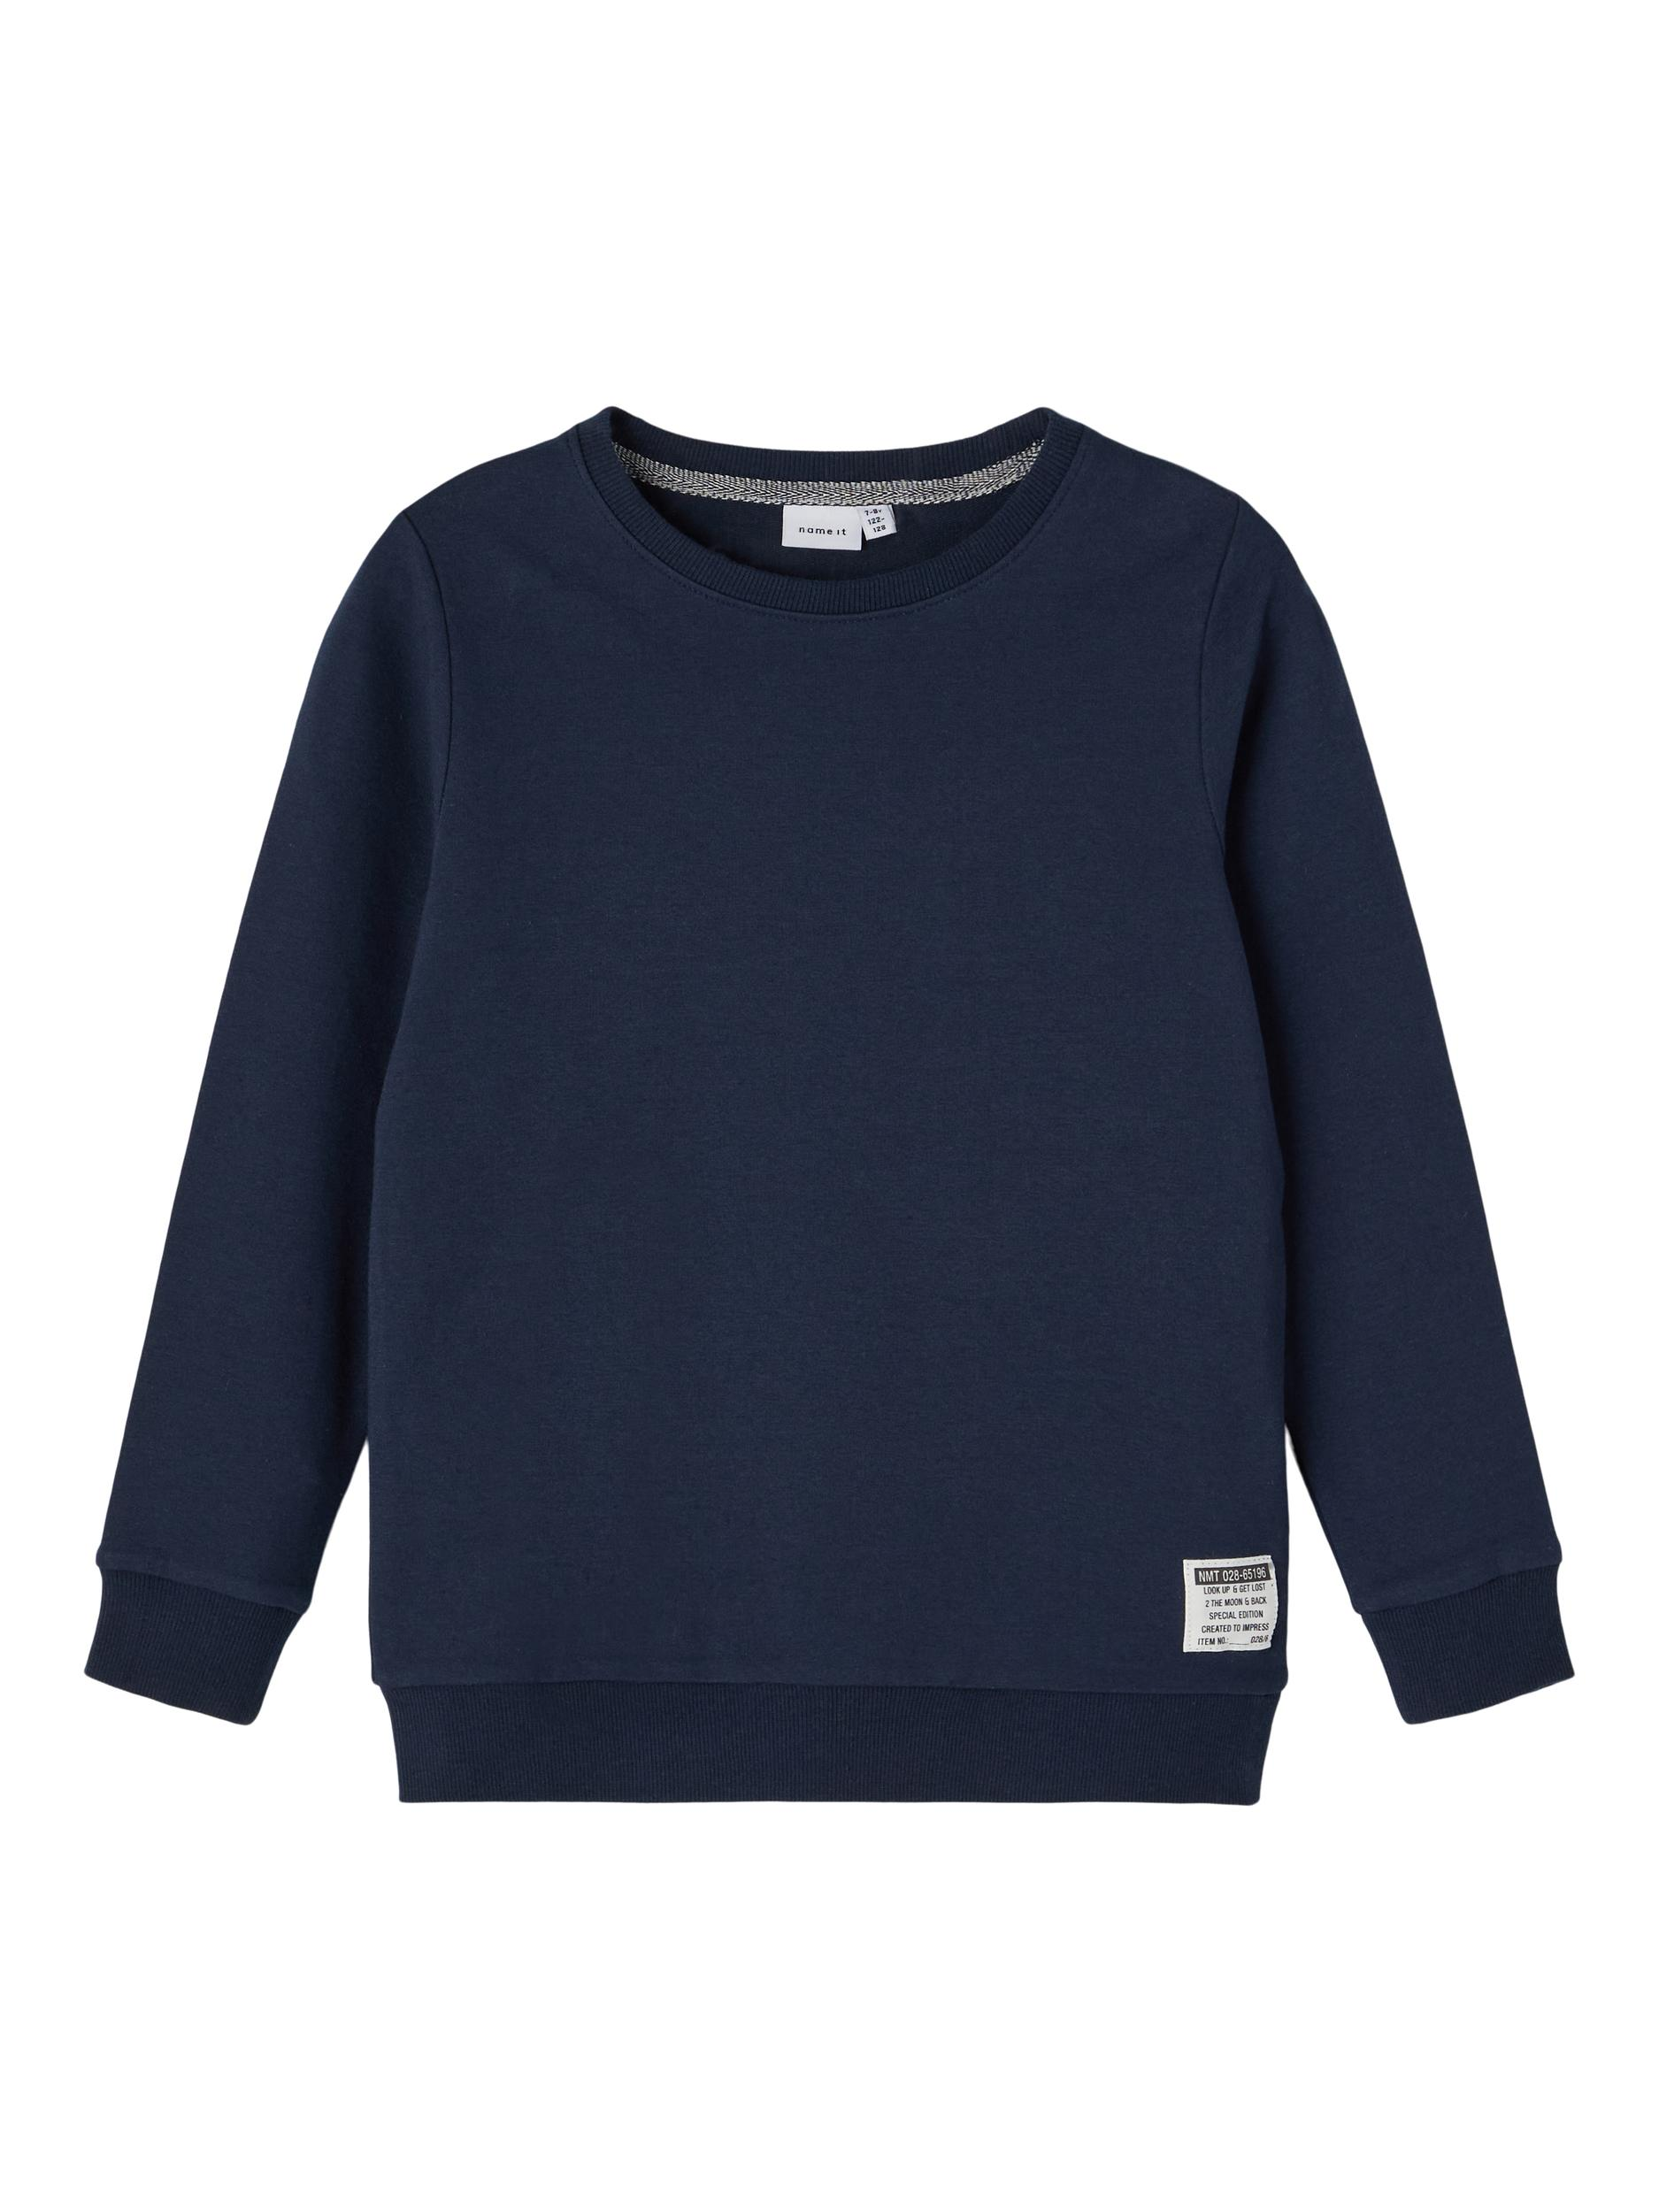 Name It Honk Sweatshirt, Dark Sapphire, 122-128